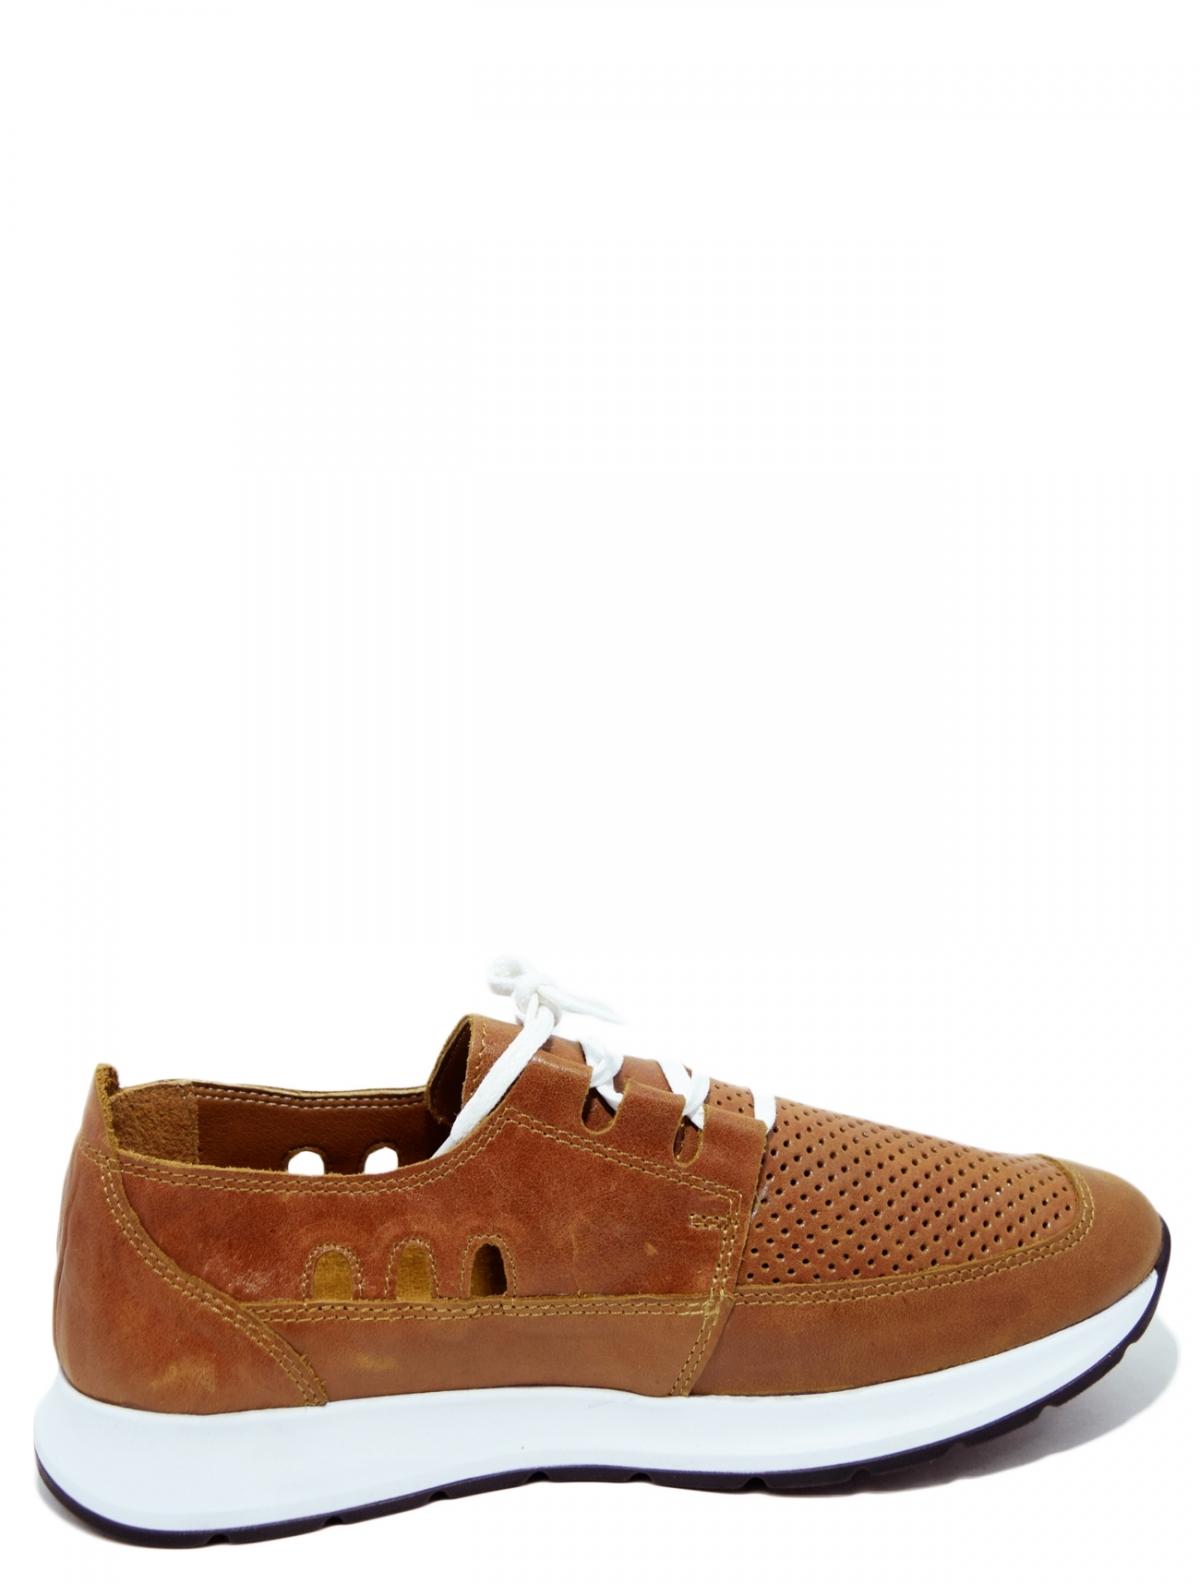 Rooman 908-025-S7L мужские туфли